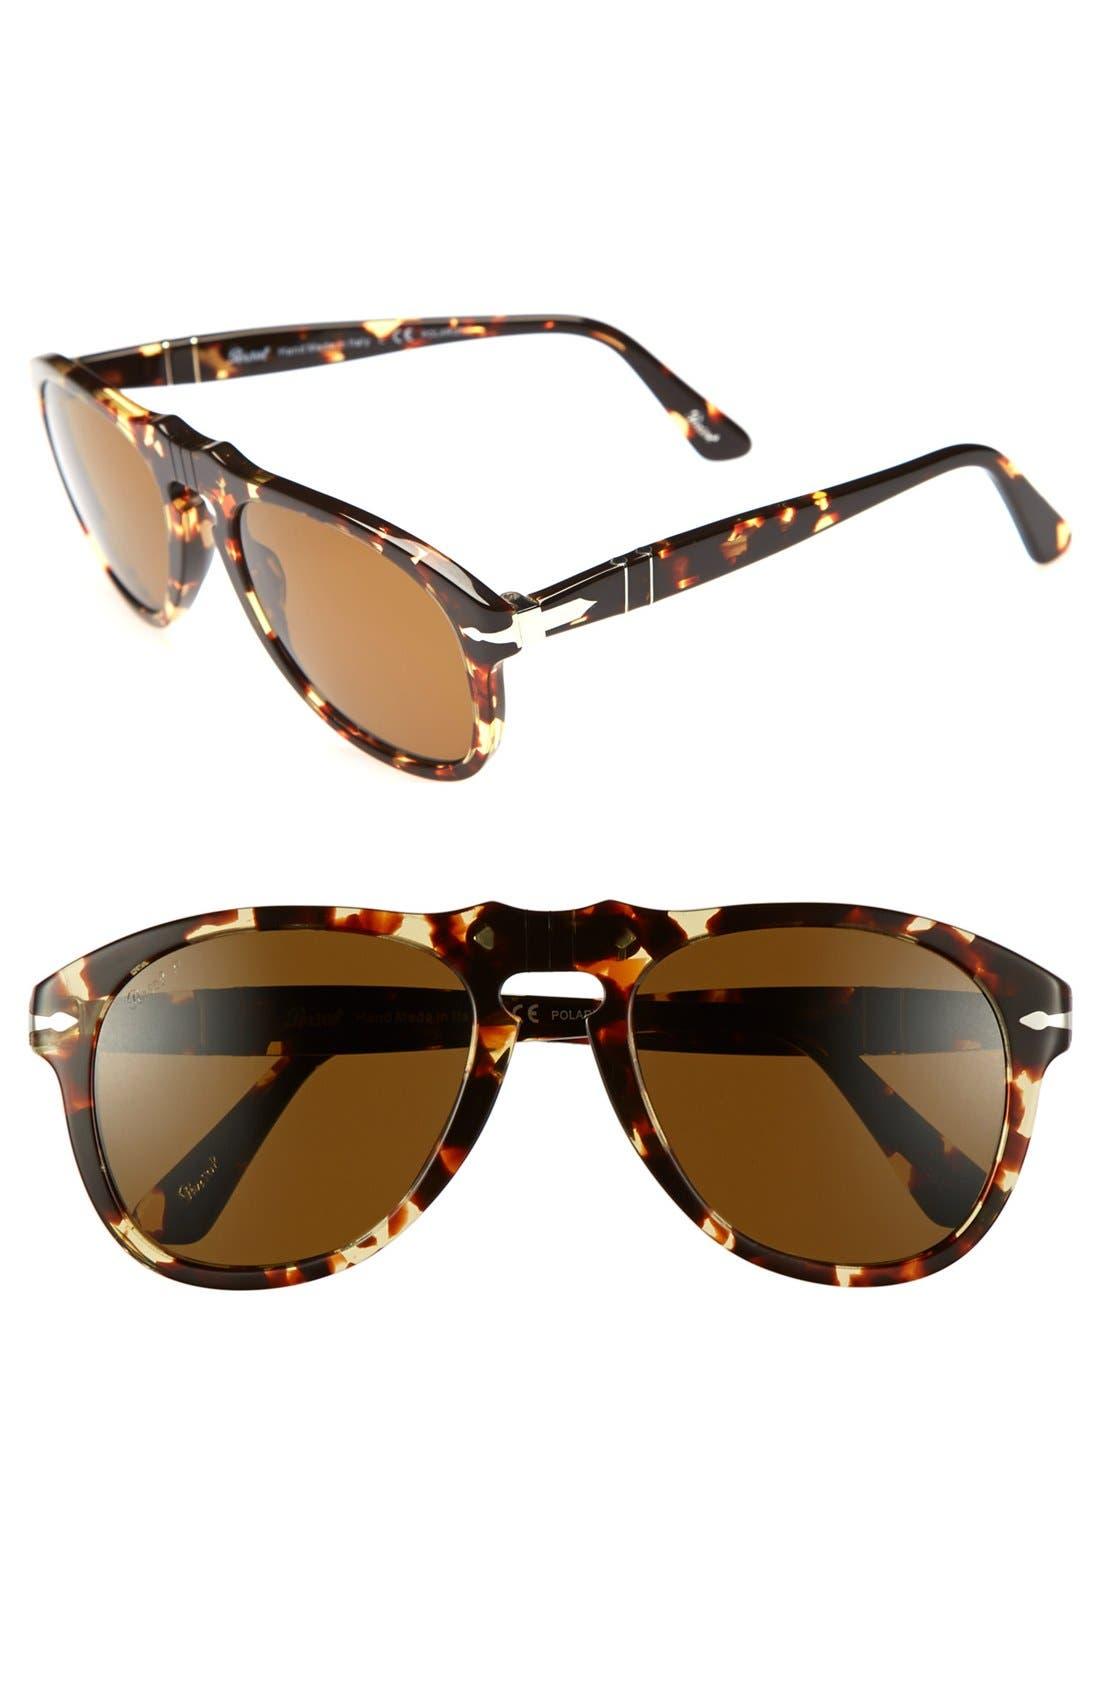 Main Image - Persol 51mm Retro Keyhole Polarized Sunglasses